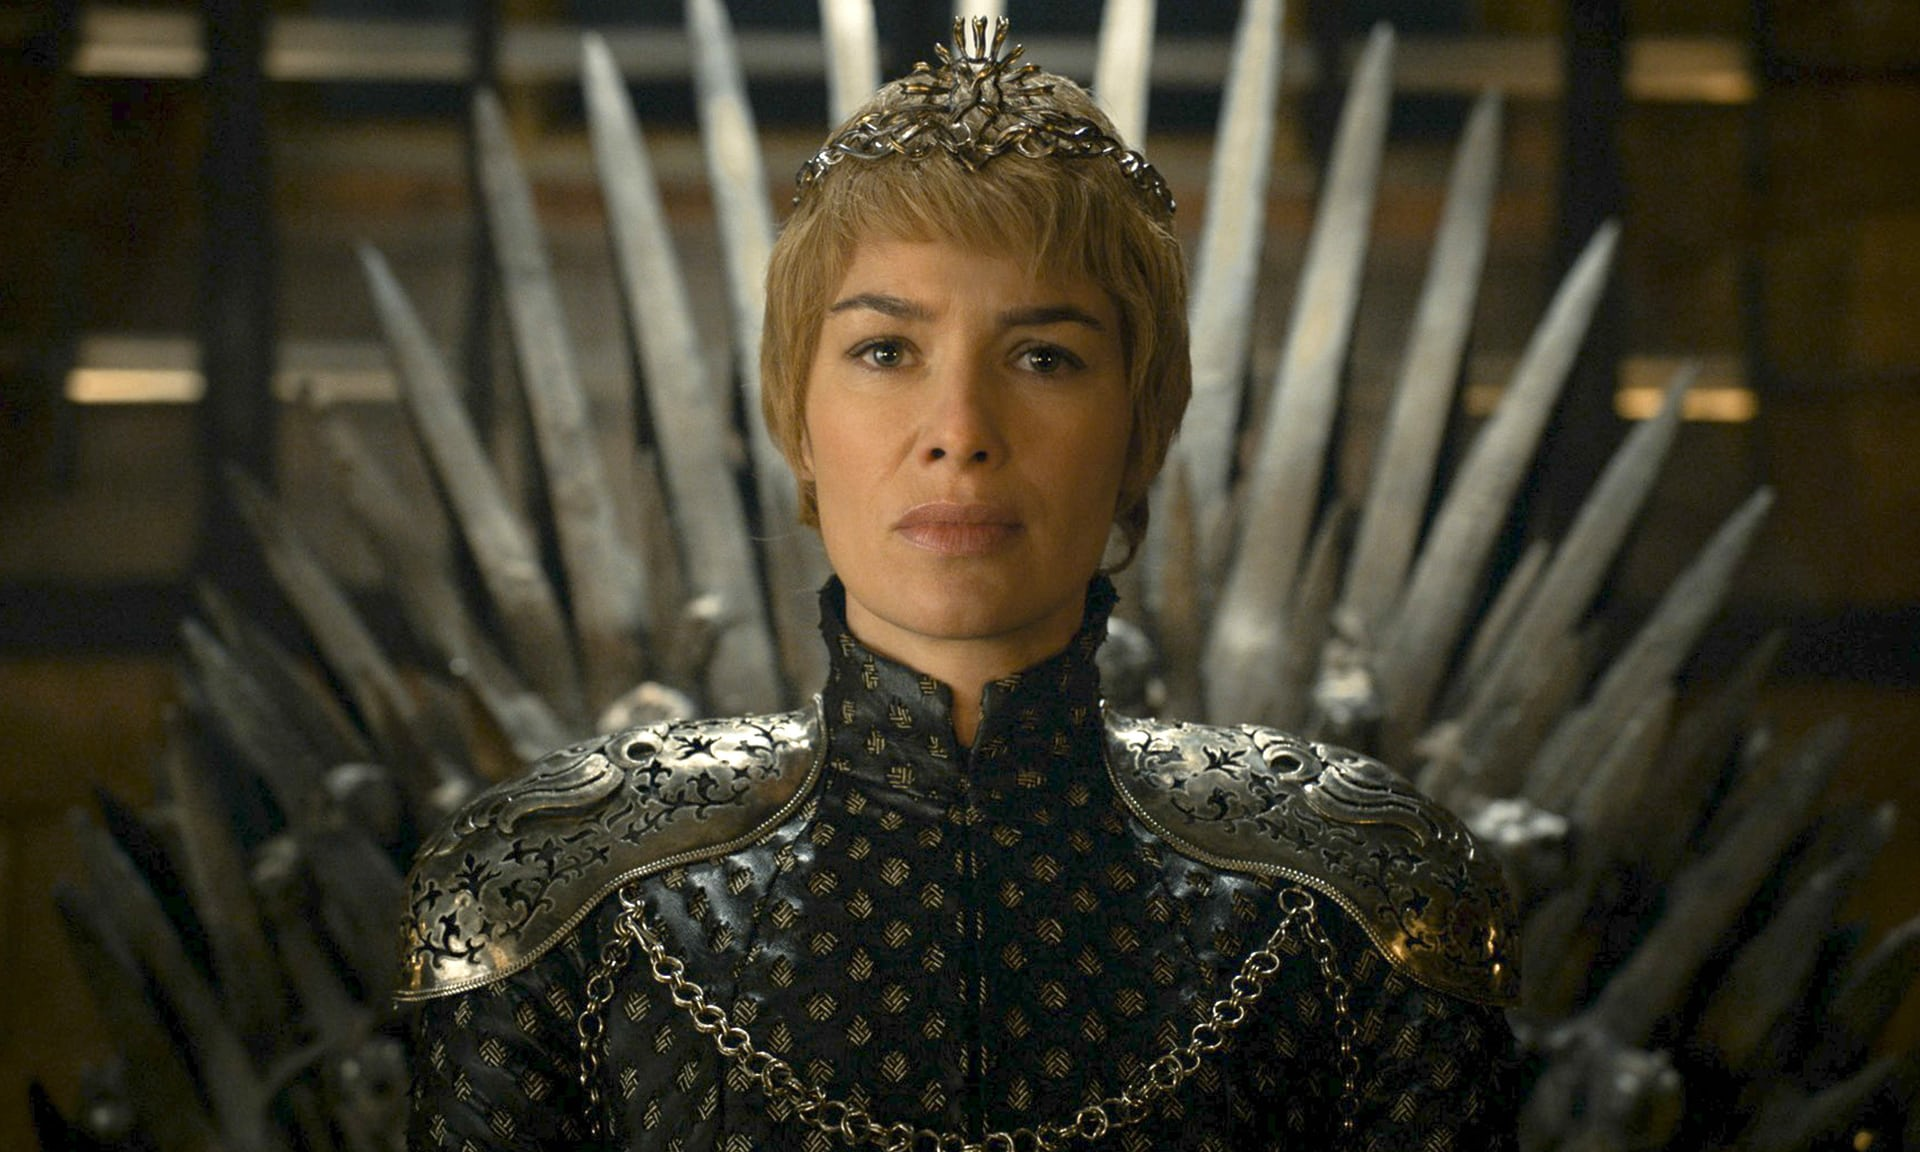 Lena_Hidi_v_roli_Sersei_Lannister_v_Igre